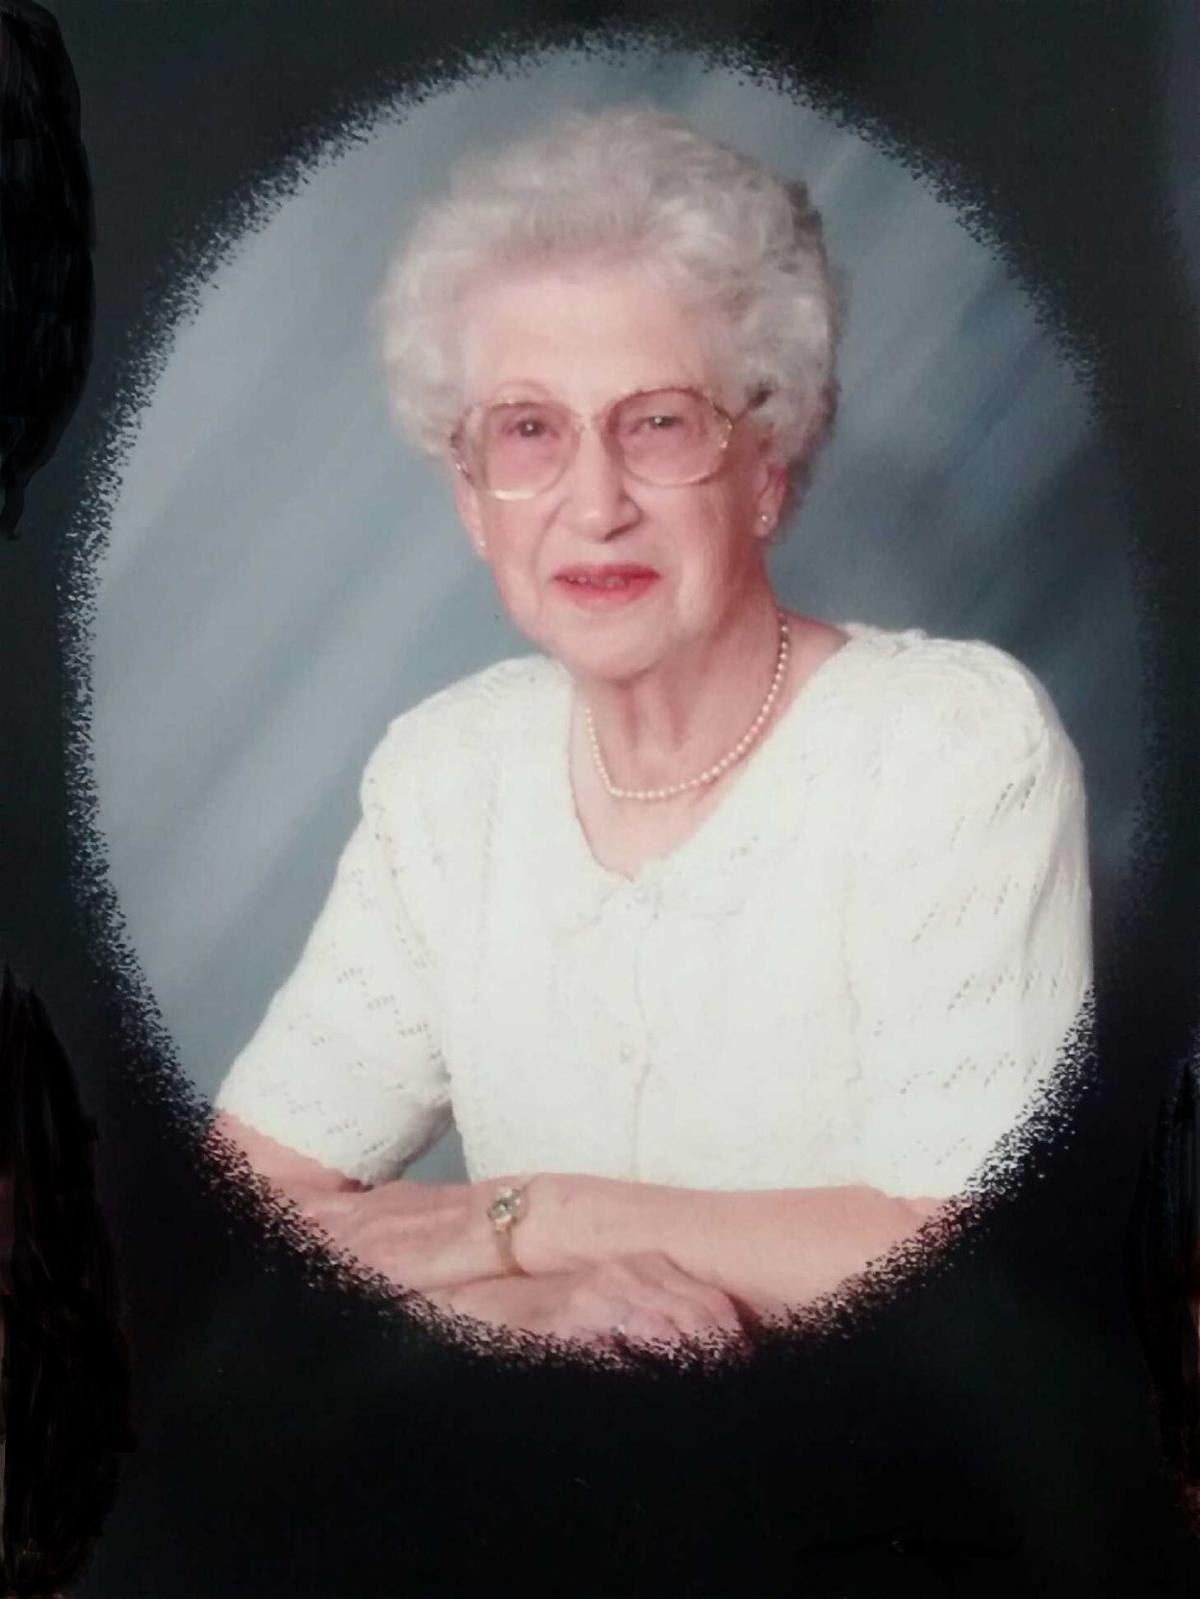 Happ 100th birthday, mom!